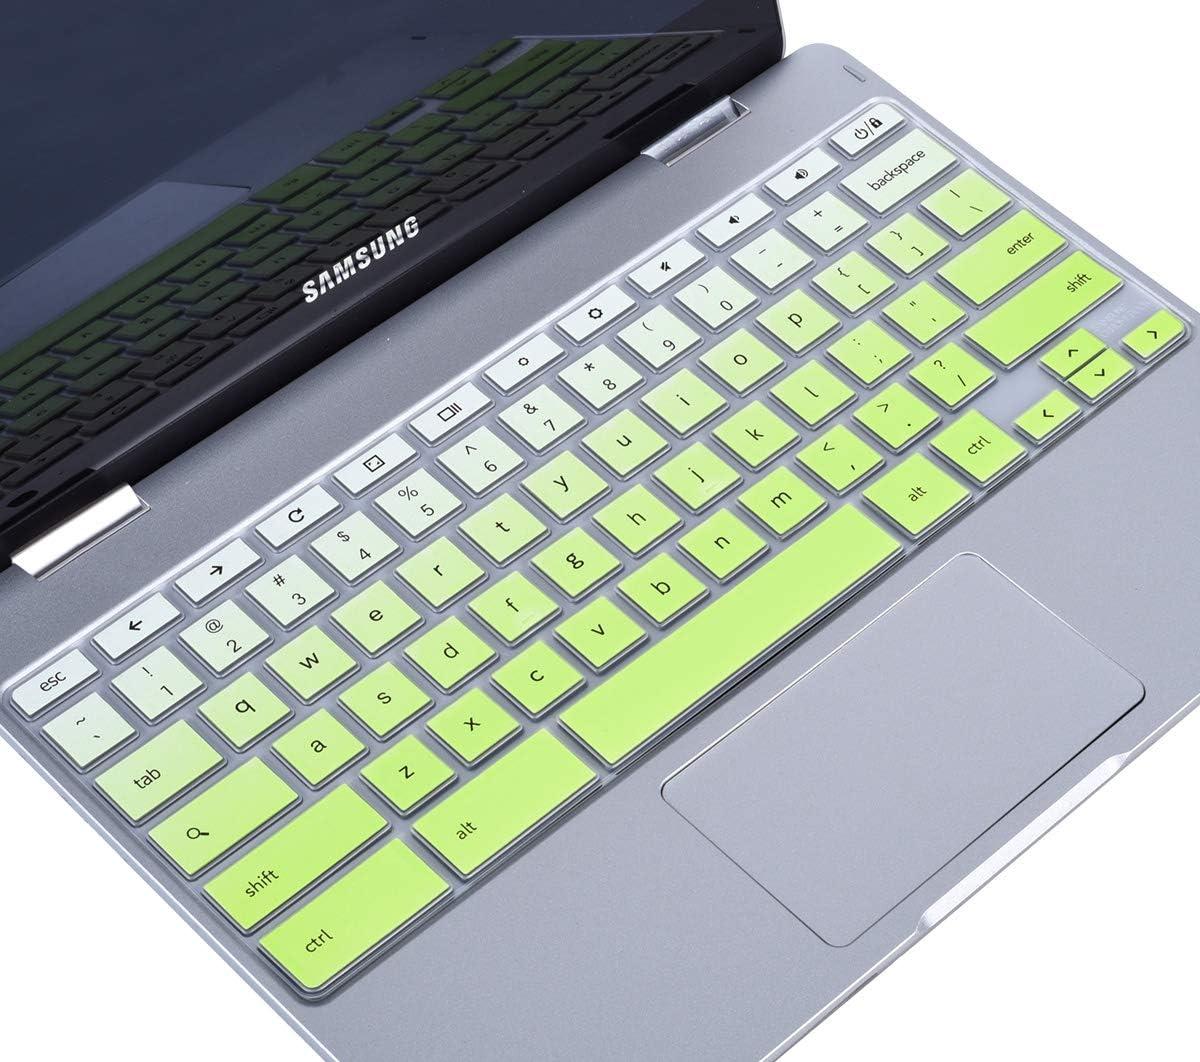 Samsung Chromebook Plus V2 2-in-1 XE520QAB 12.2 Keyboard Protector Gradual Blue Keyboard Cover Skin for 2019//2018 Samsung Chromebook 3 XE500C13 XE501C13 11.6 11.6 Samsung Chromebook 2 XE500C12